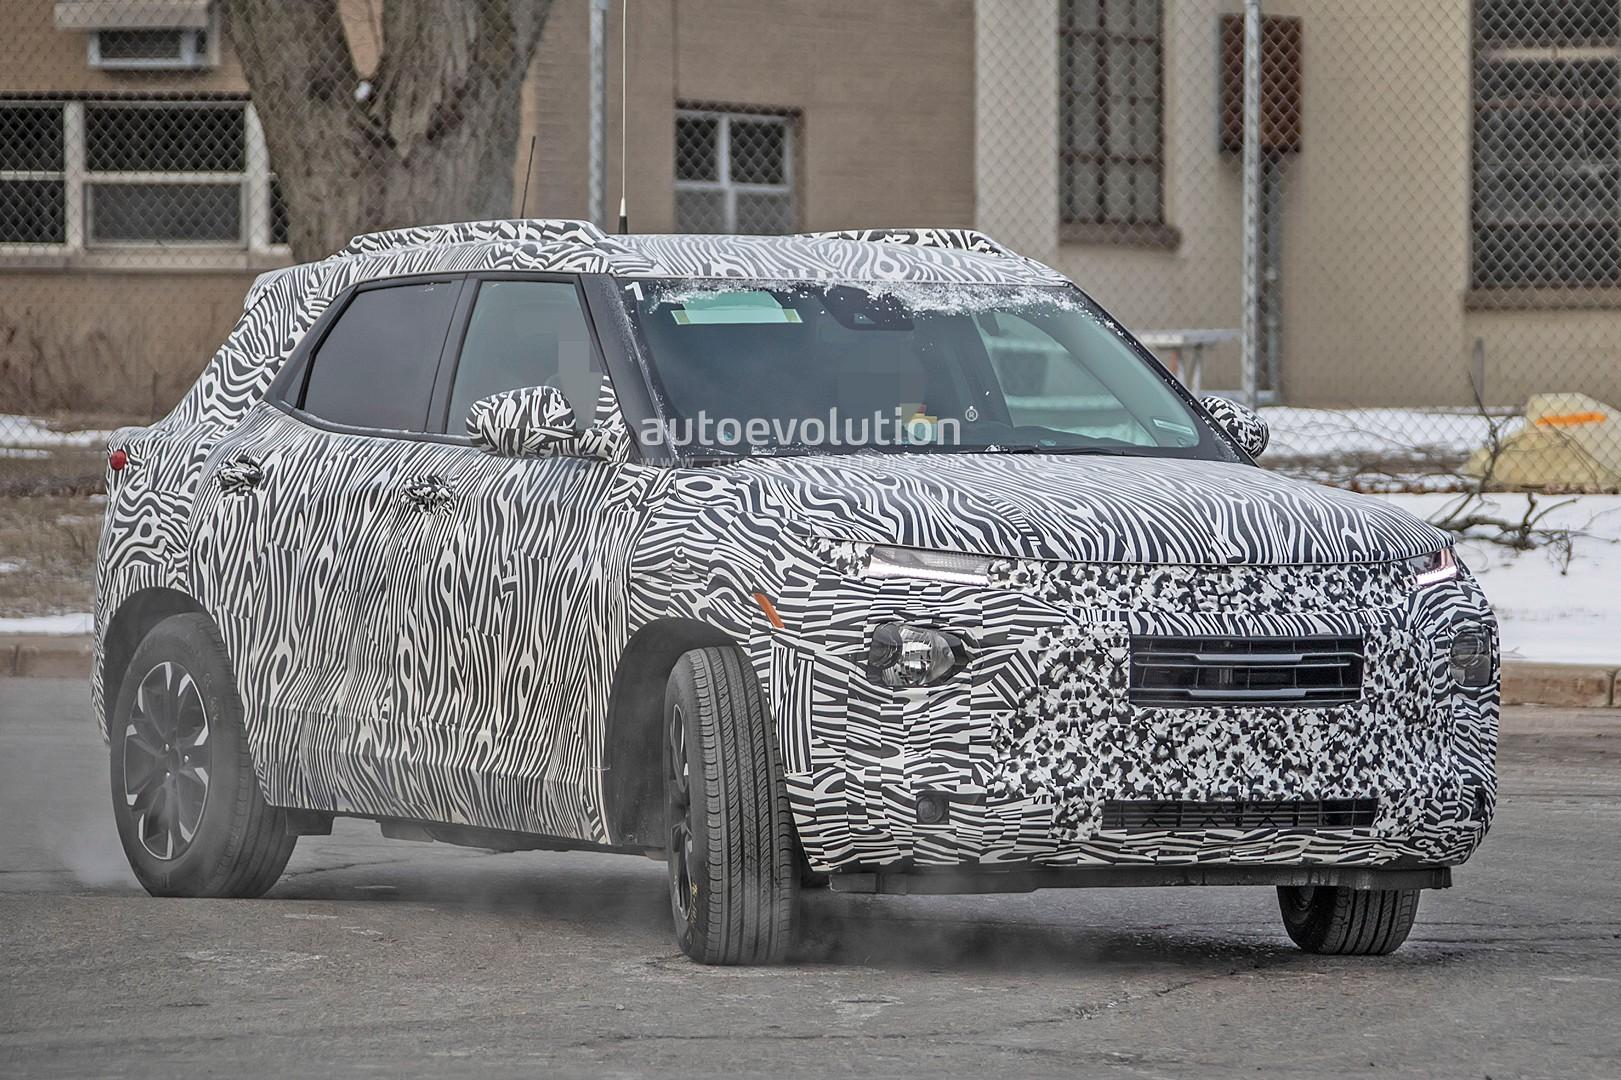 2020 Chevy Trax Spied With Blazer-Like Looks - autoevolution